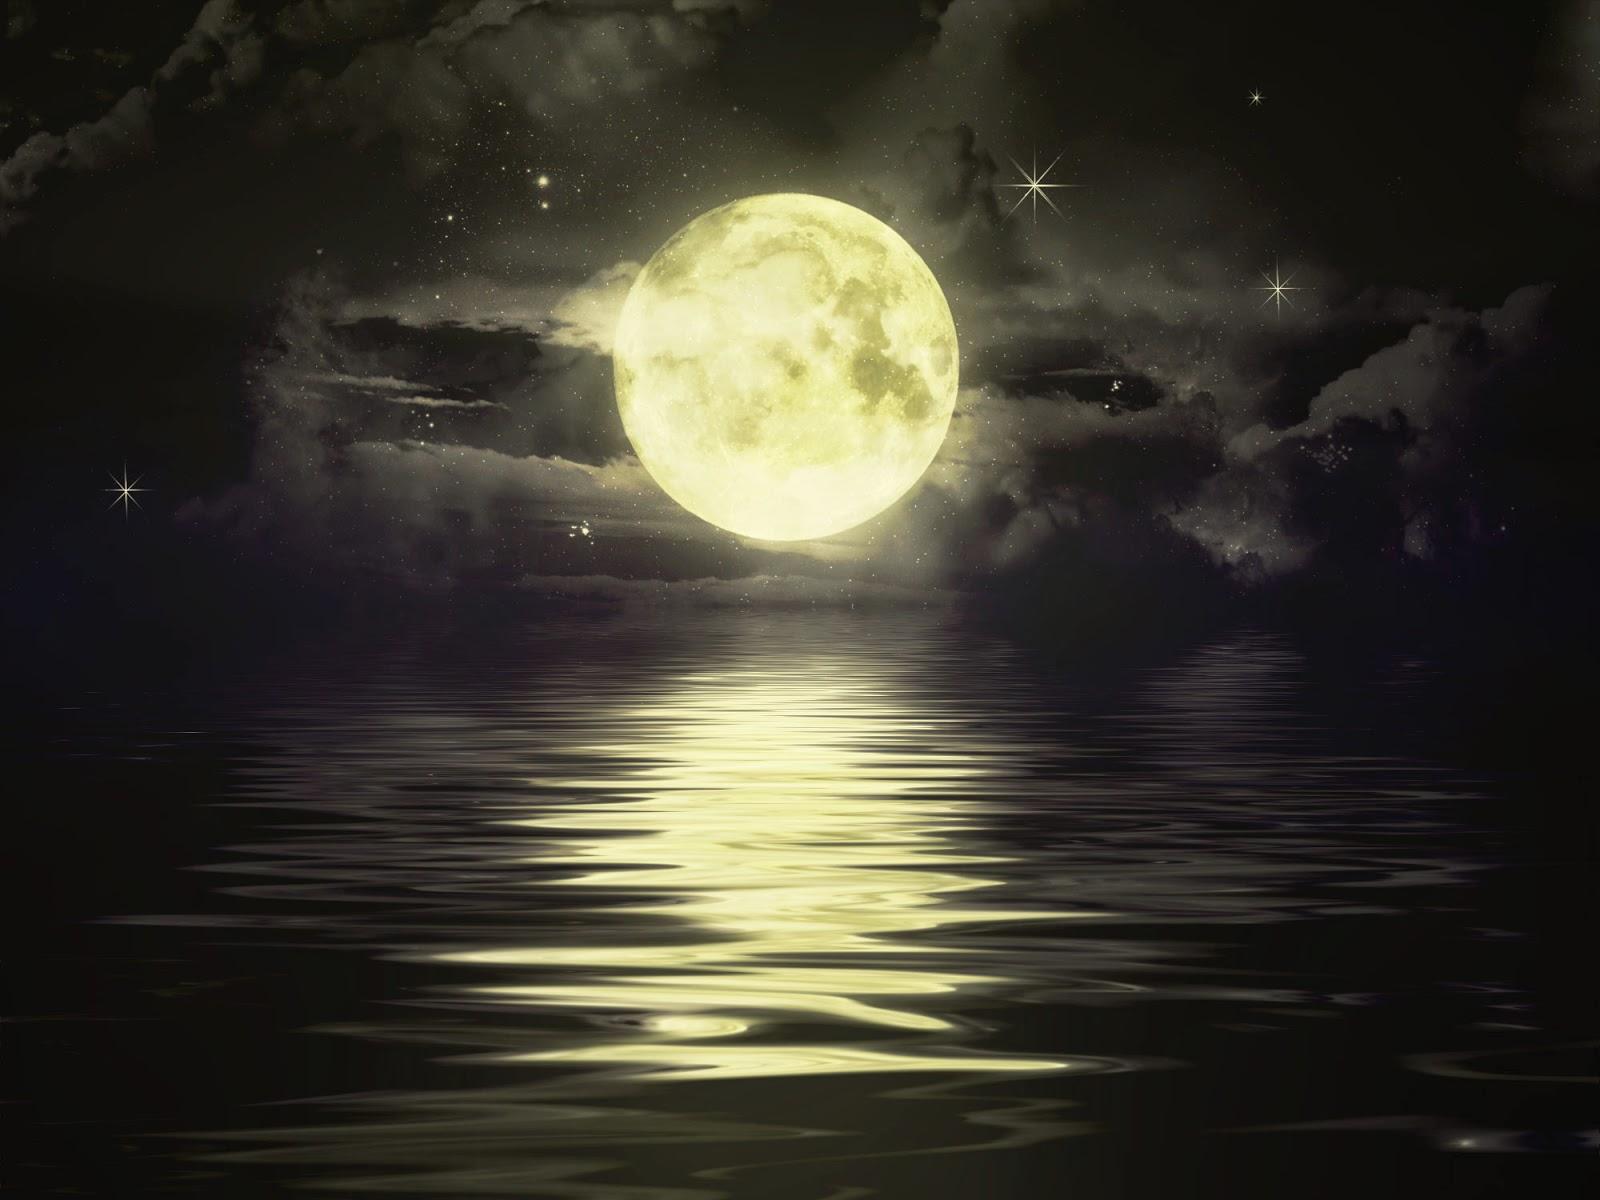 Moon-image-with-stars-near-sea-at-night-pic.jpg